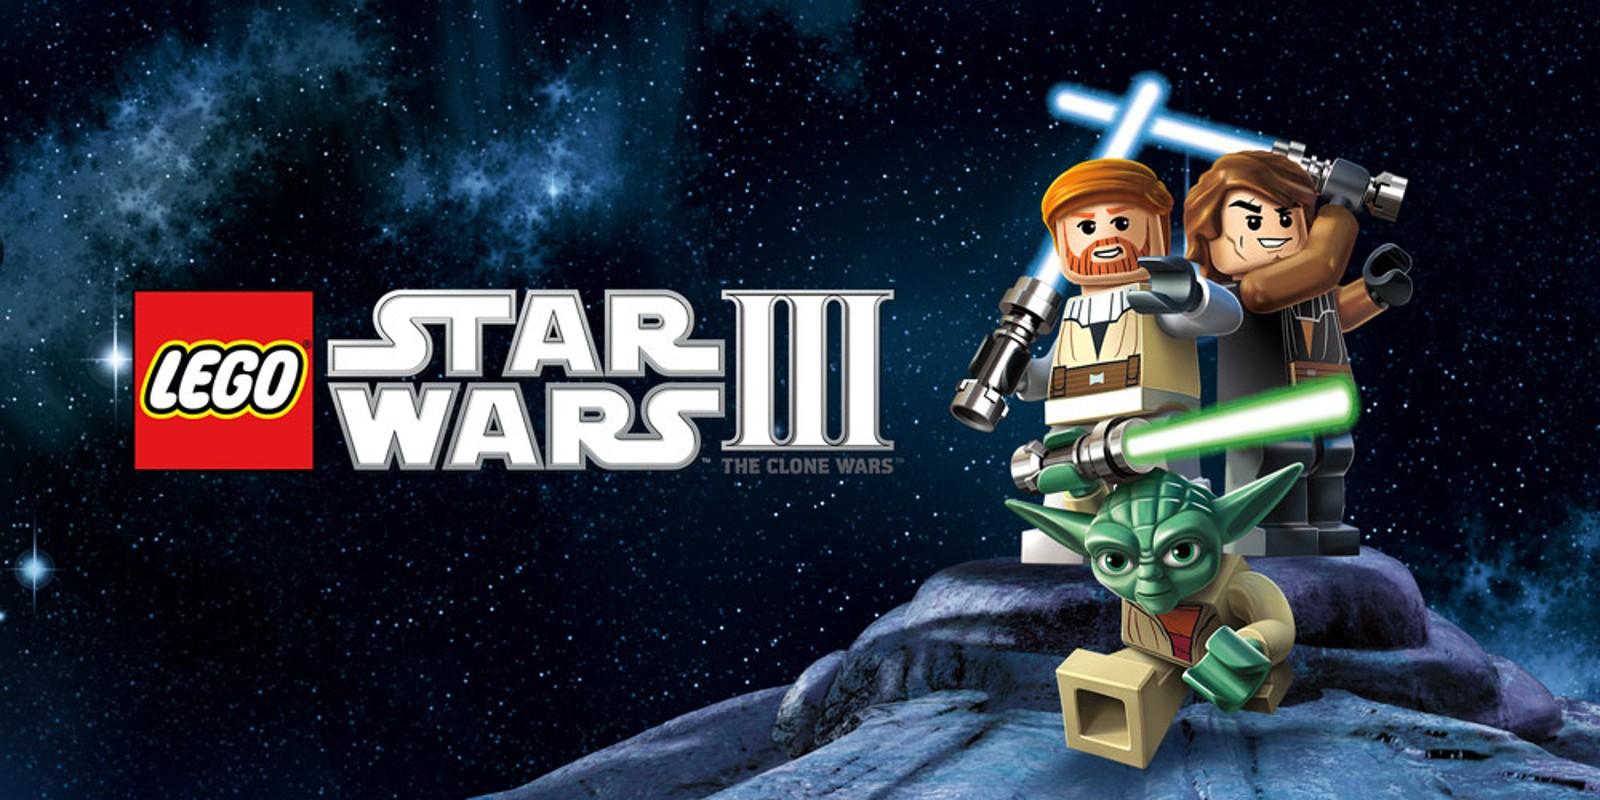 Lego 174 Star Wars Iii The Clone Wars Nintendo Ds